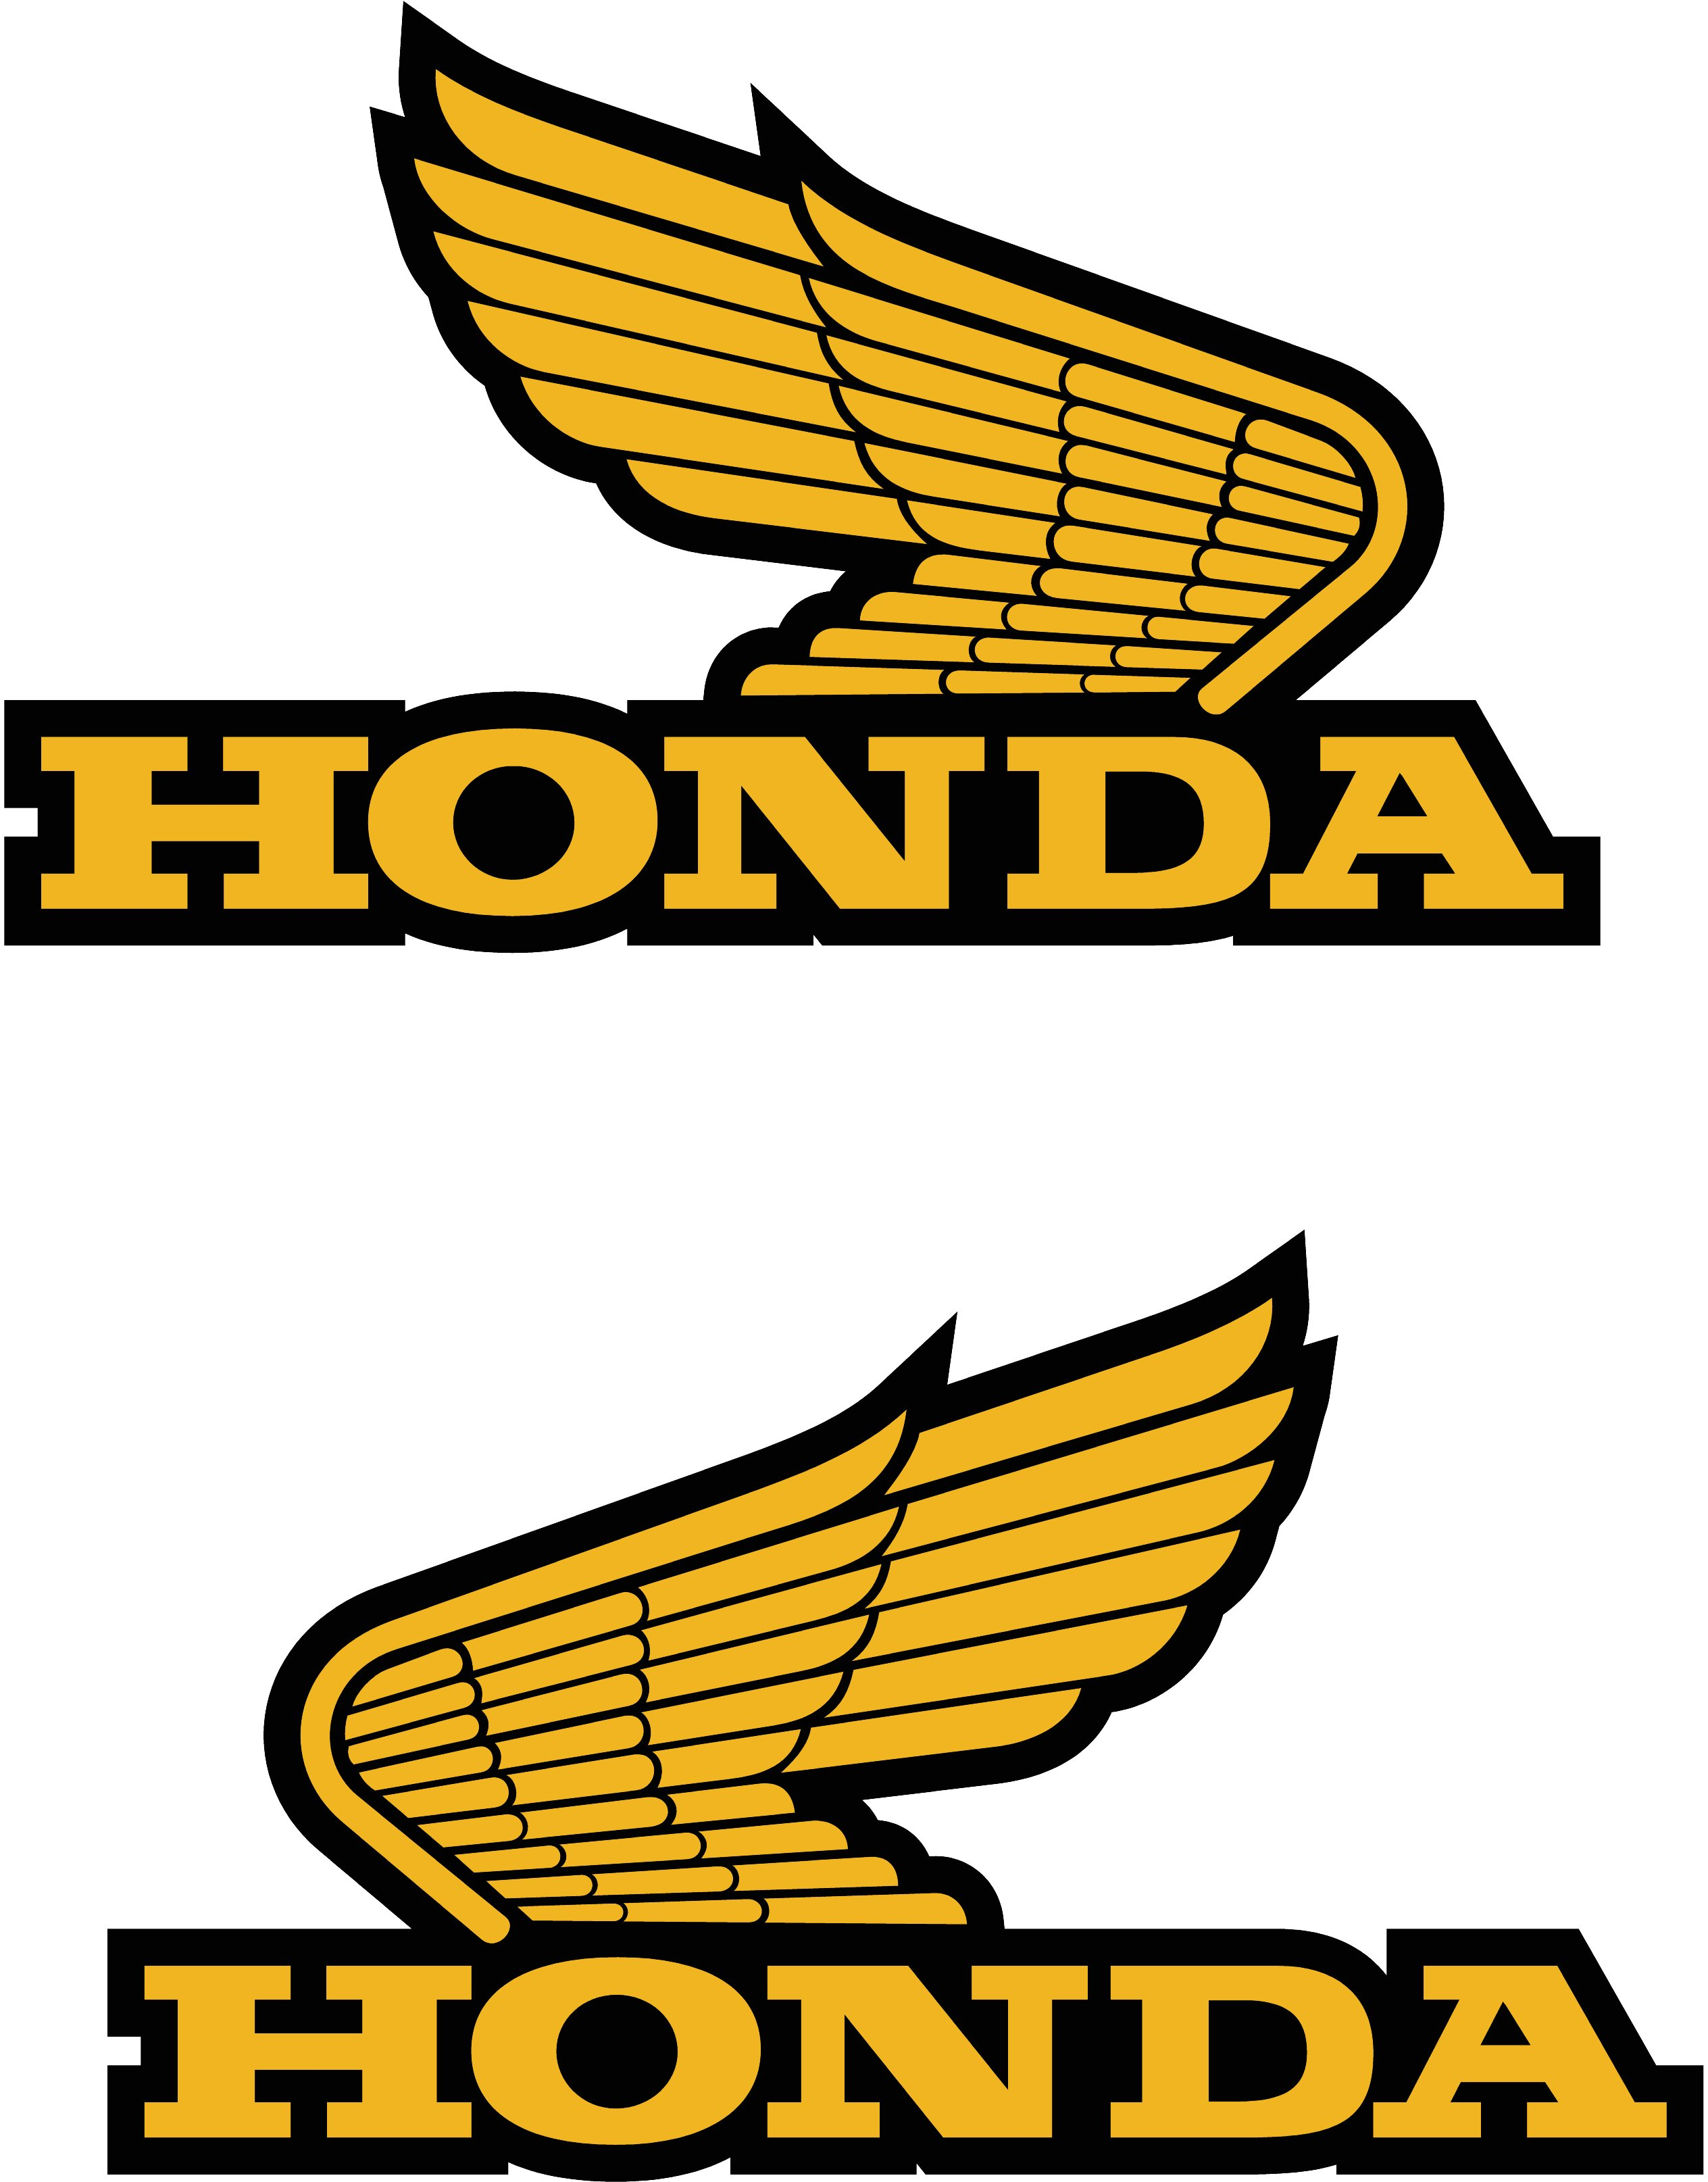 evoluci n e historia del logo de honda motocicletas the cubs rh pinterest com lego honda civic lego honda accord